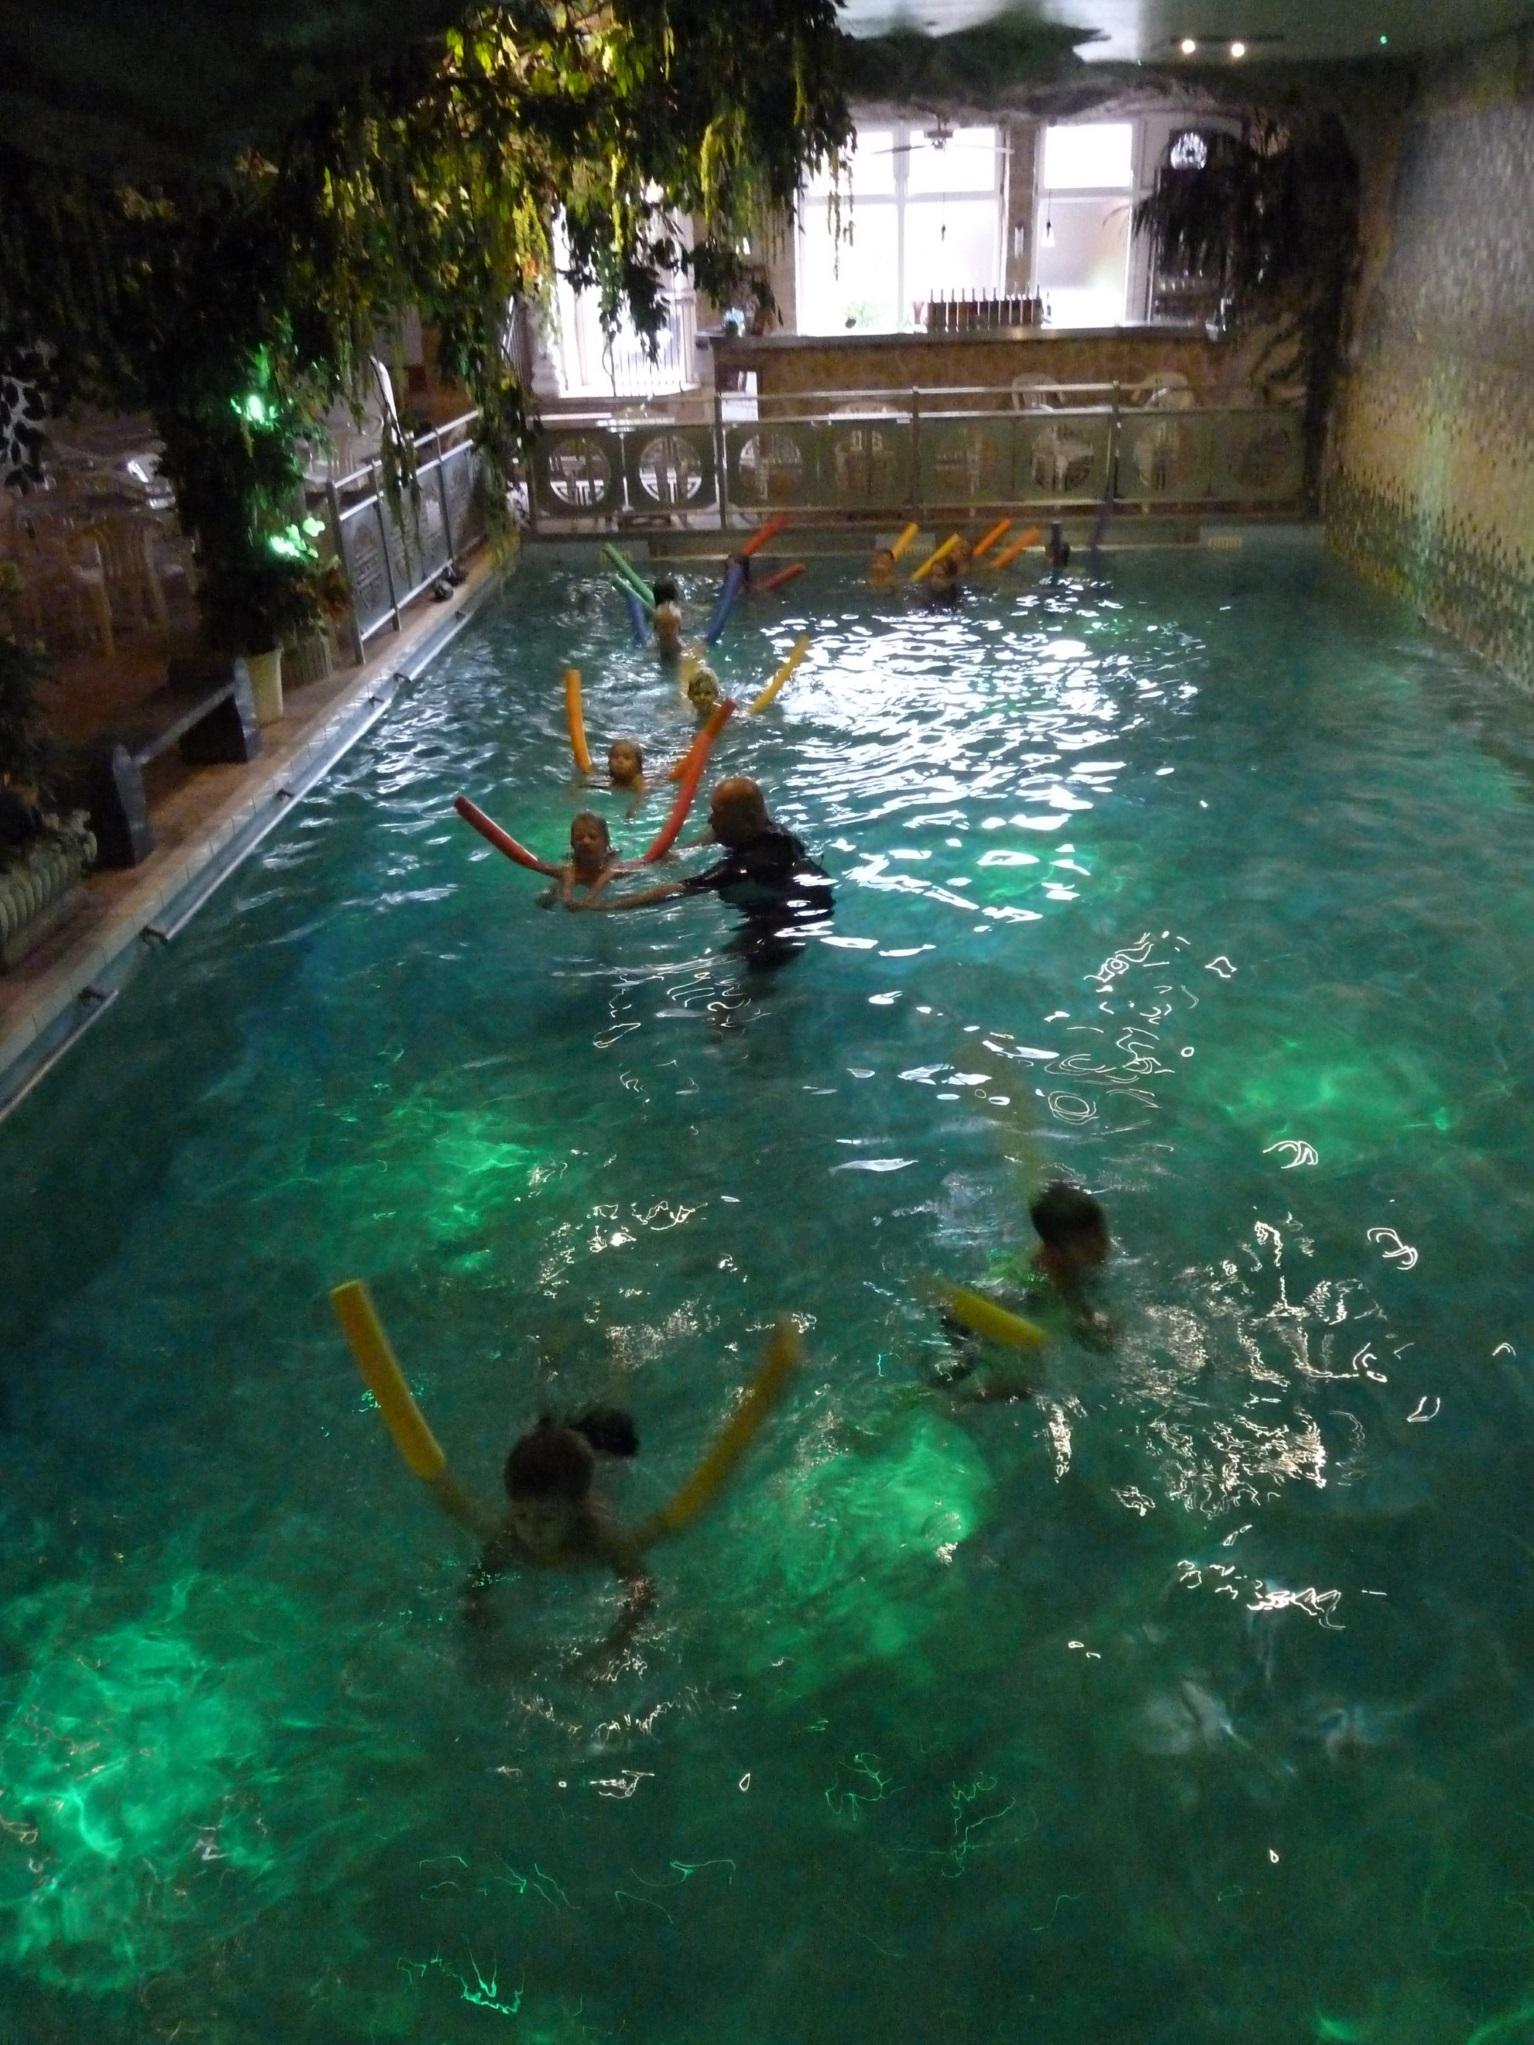 Sterne Hotel S Ef Bf Bddtirol Mit Pool